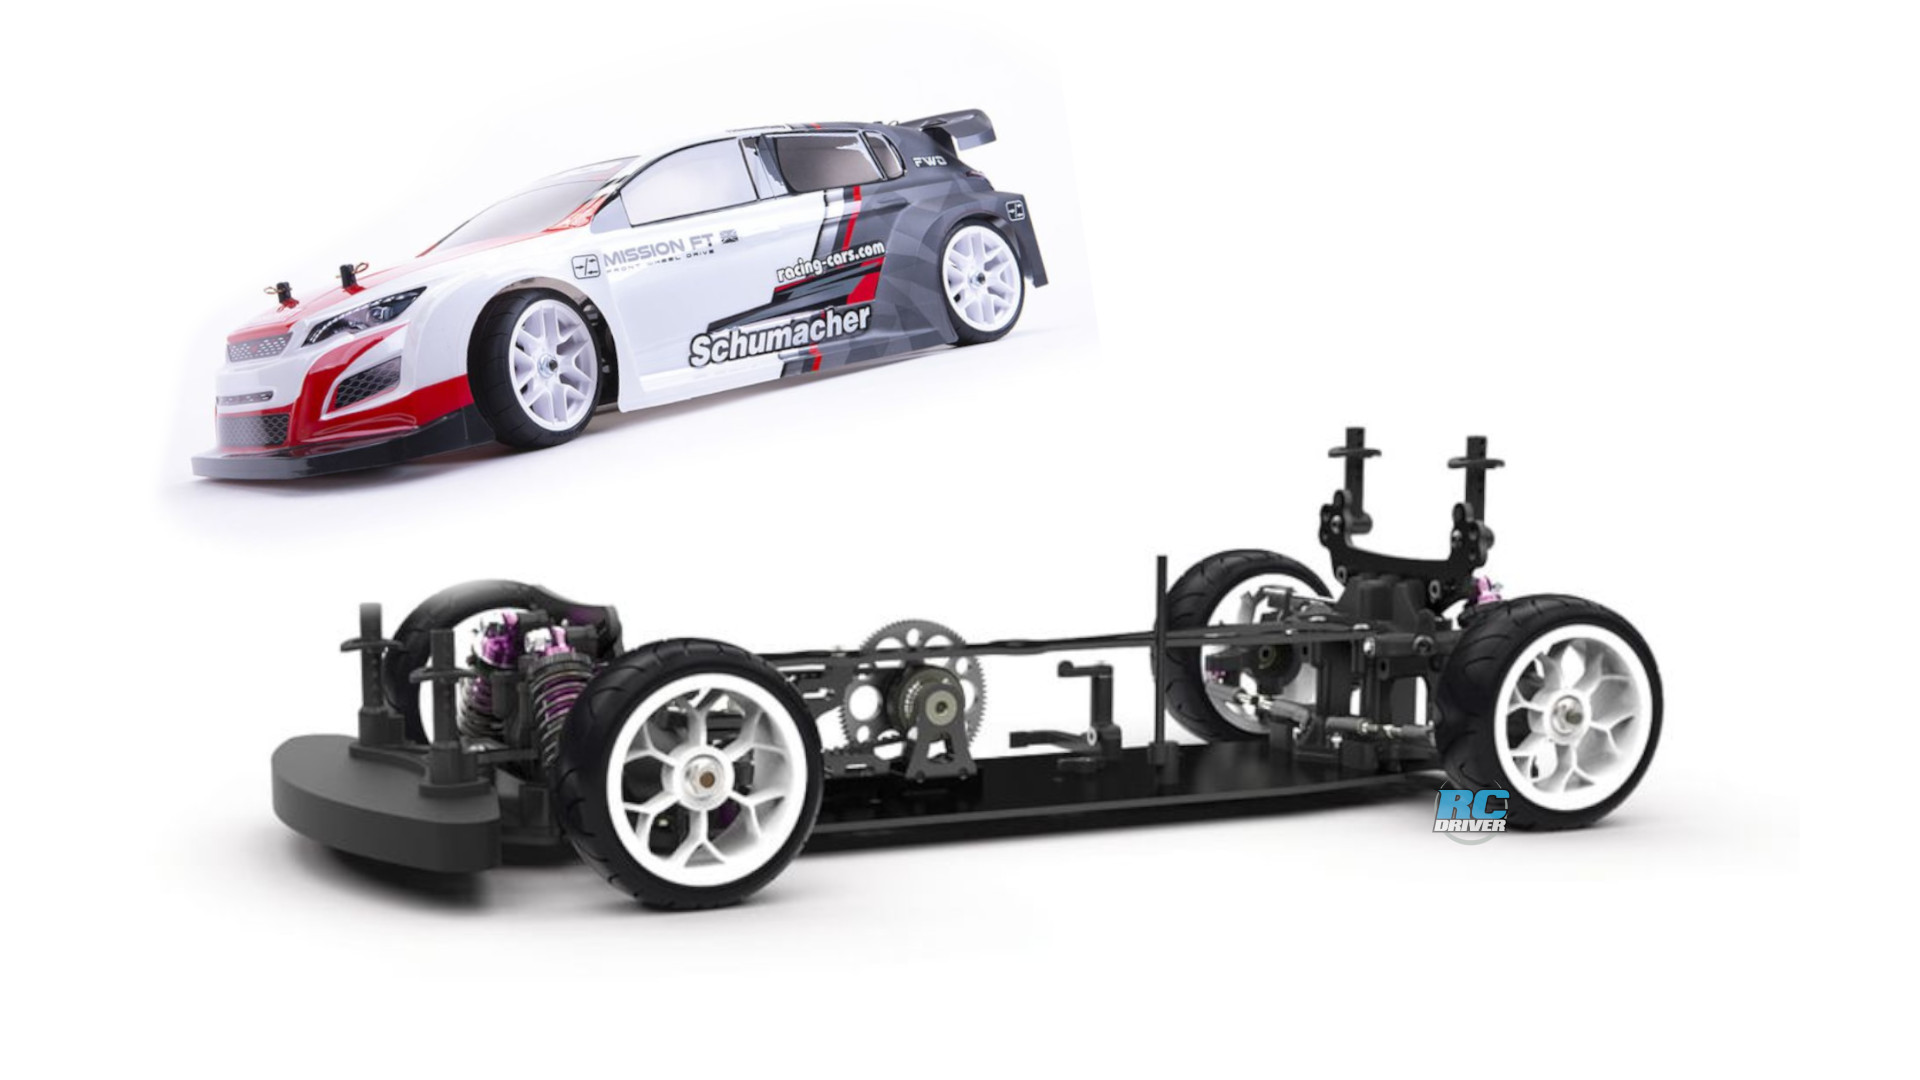 Schumacher Mission FT front wheel drive touring car